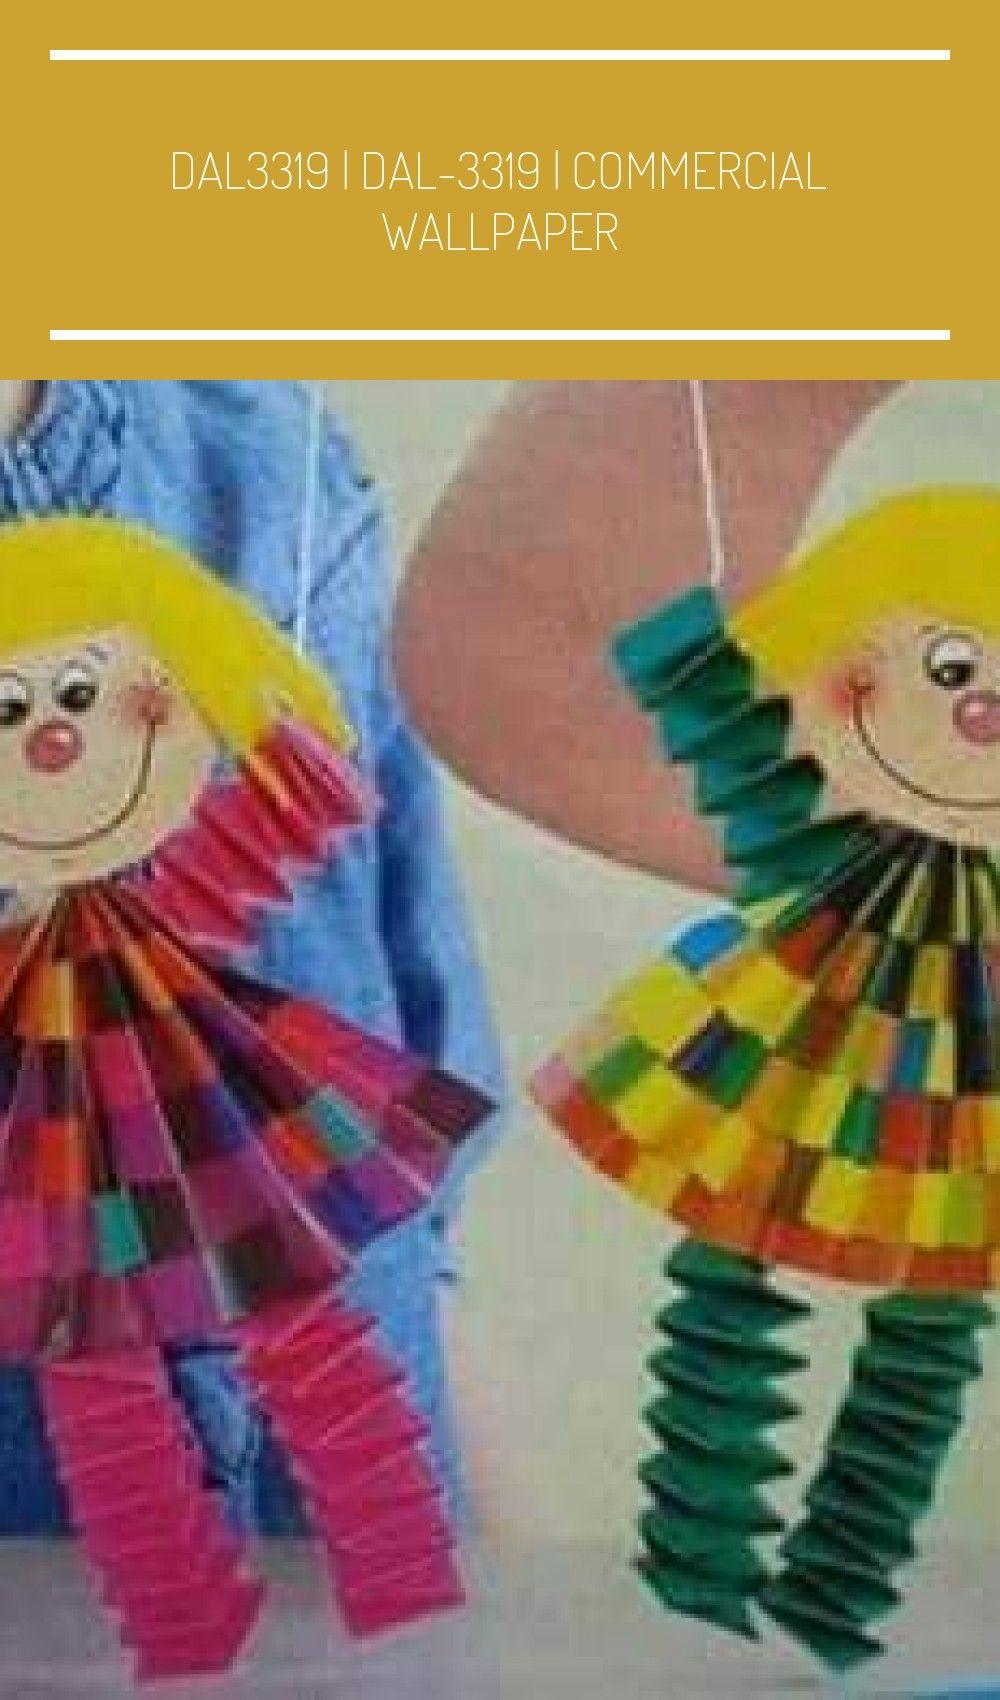 Puppen aus Papier falten #arte della carta Puppen aus Papier falten ,  #aus #falten #Papier #Puppen